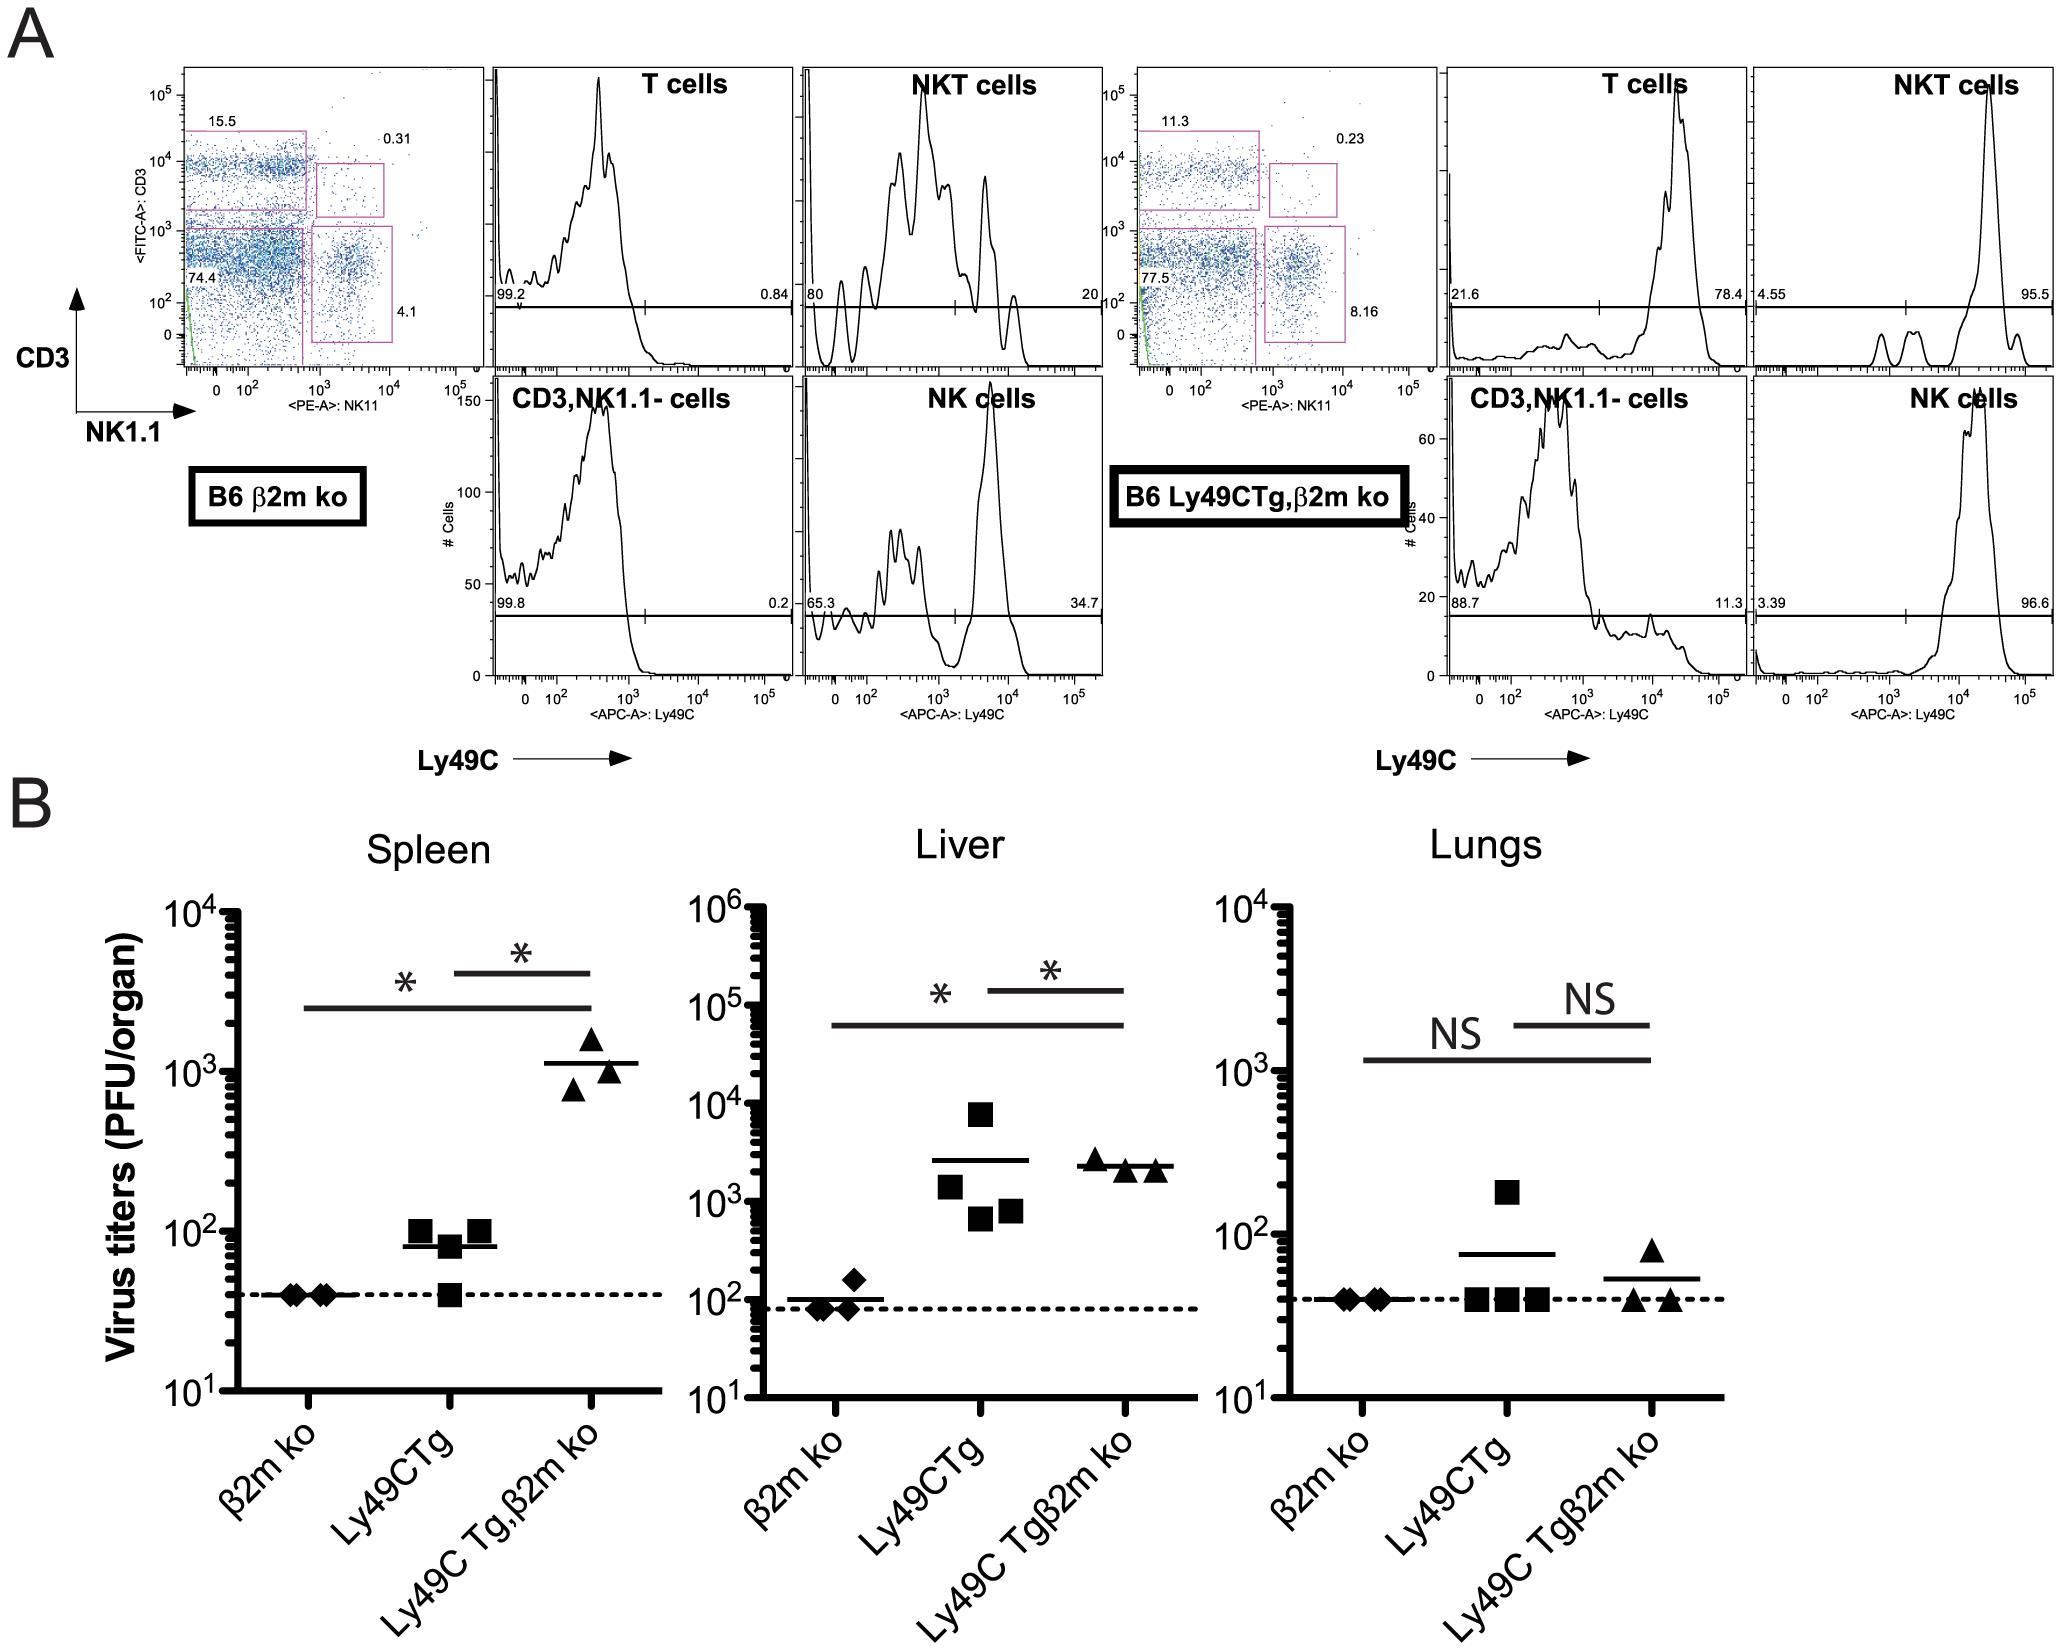 Infection of B6 Ly49C Tg β2m ko mice by MCMVm157<sup>G1F</sup>.